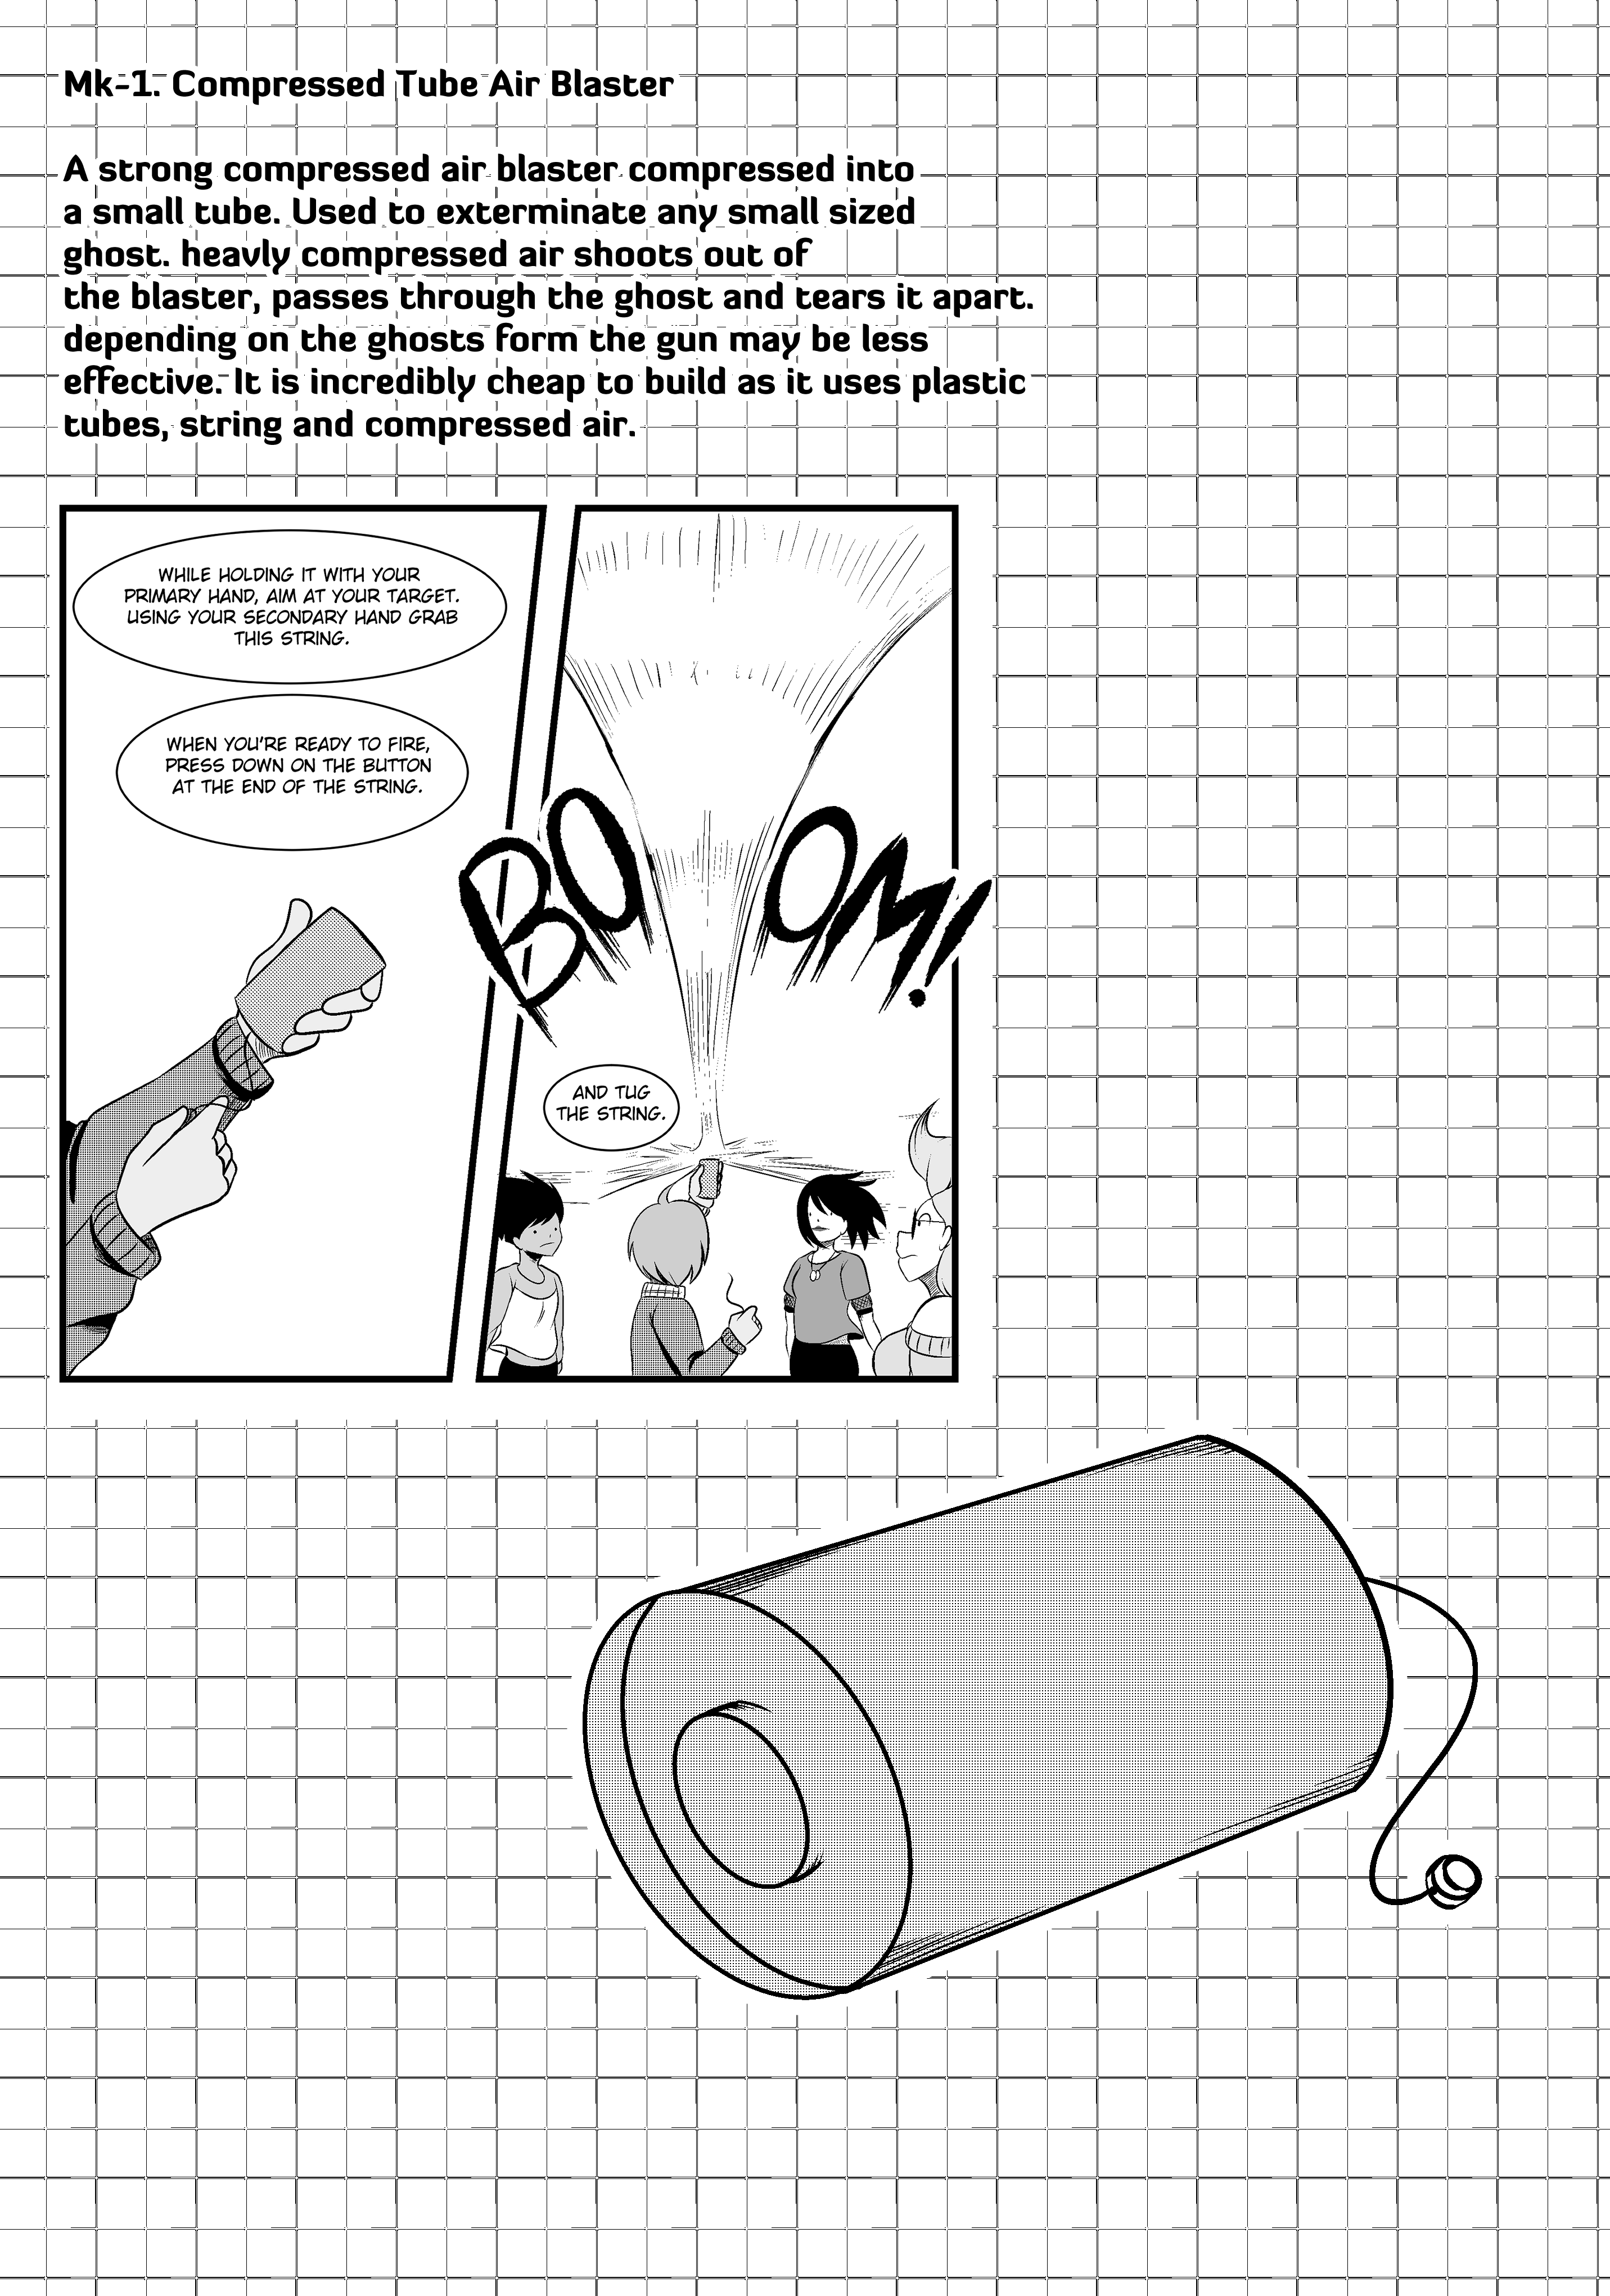 File #4: Mk-1. Compressed Tube Air Blaster